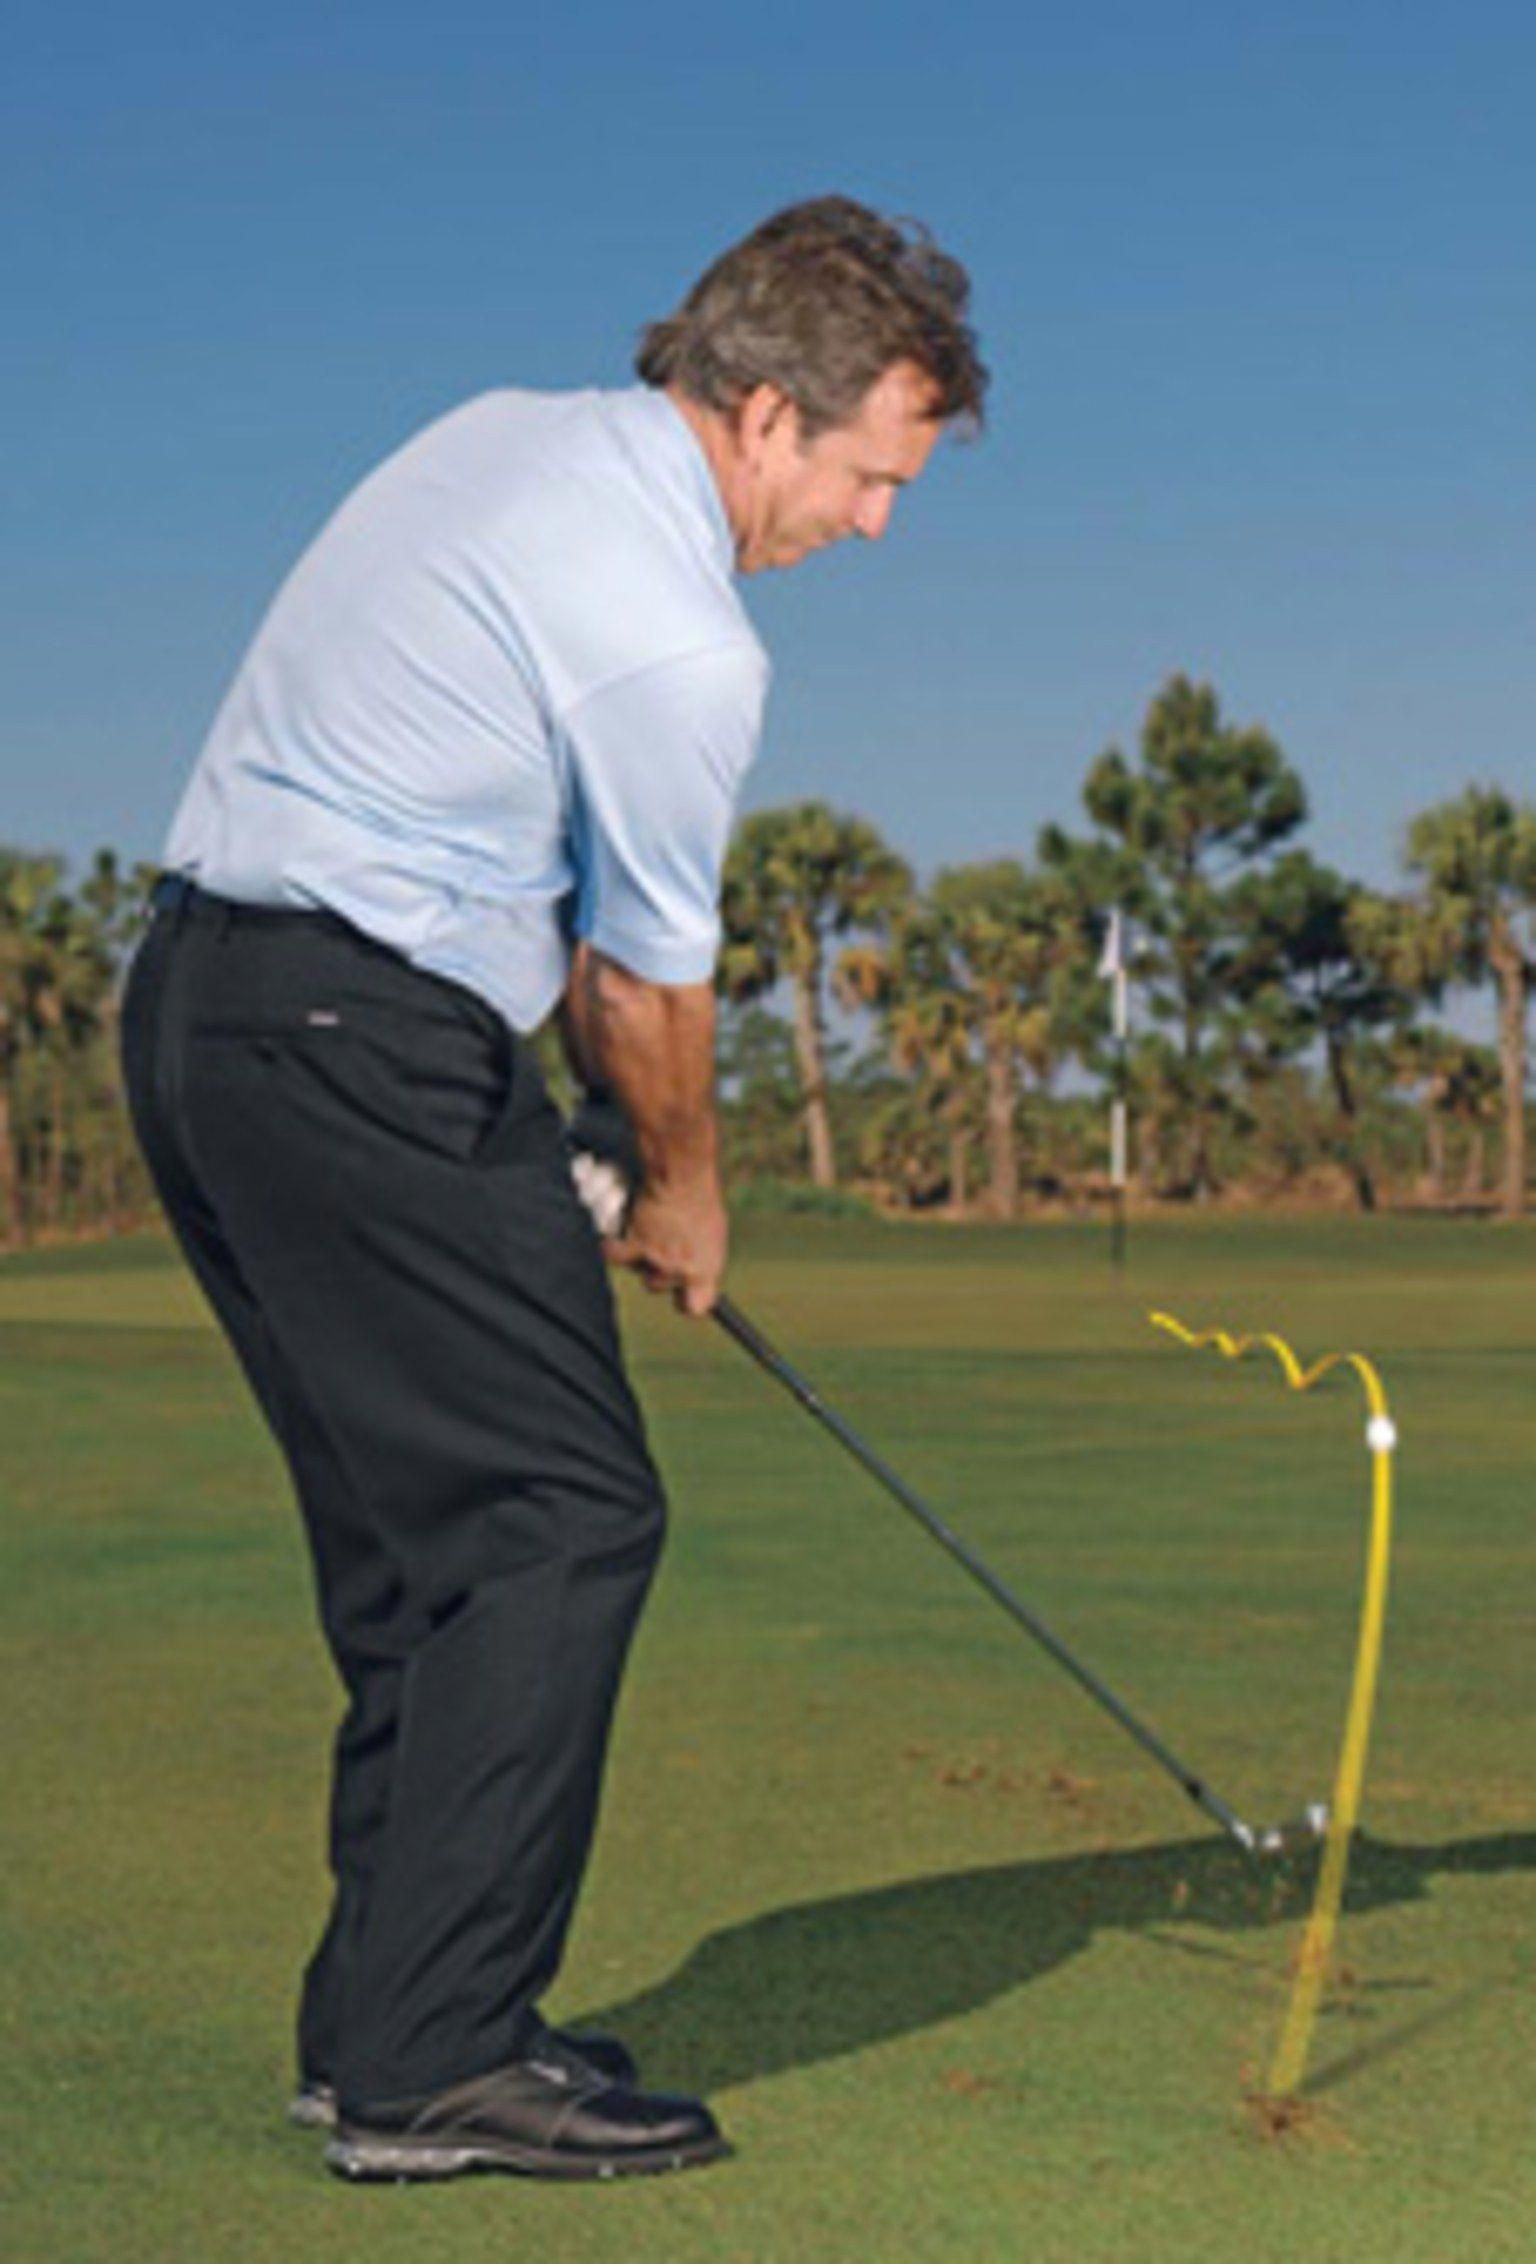 golf swing basics golftipbeginner in 2020 Short game